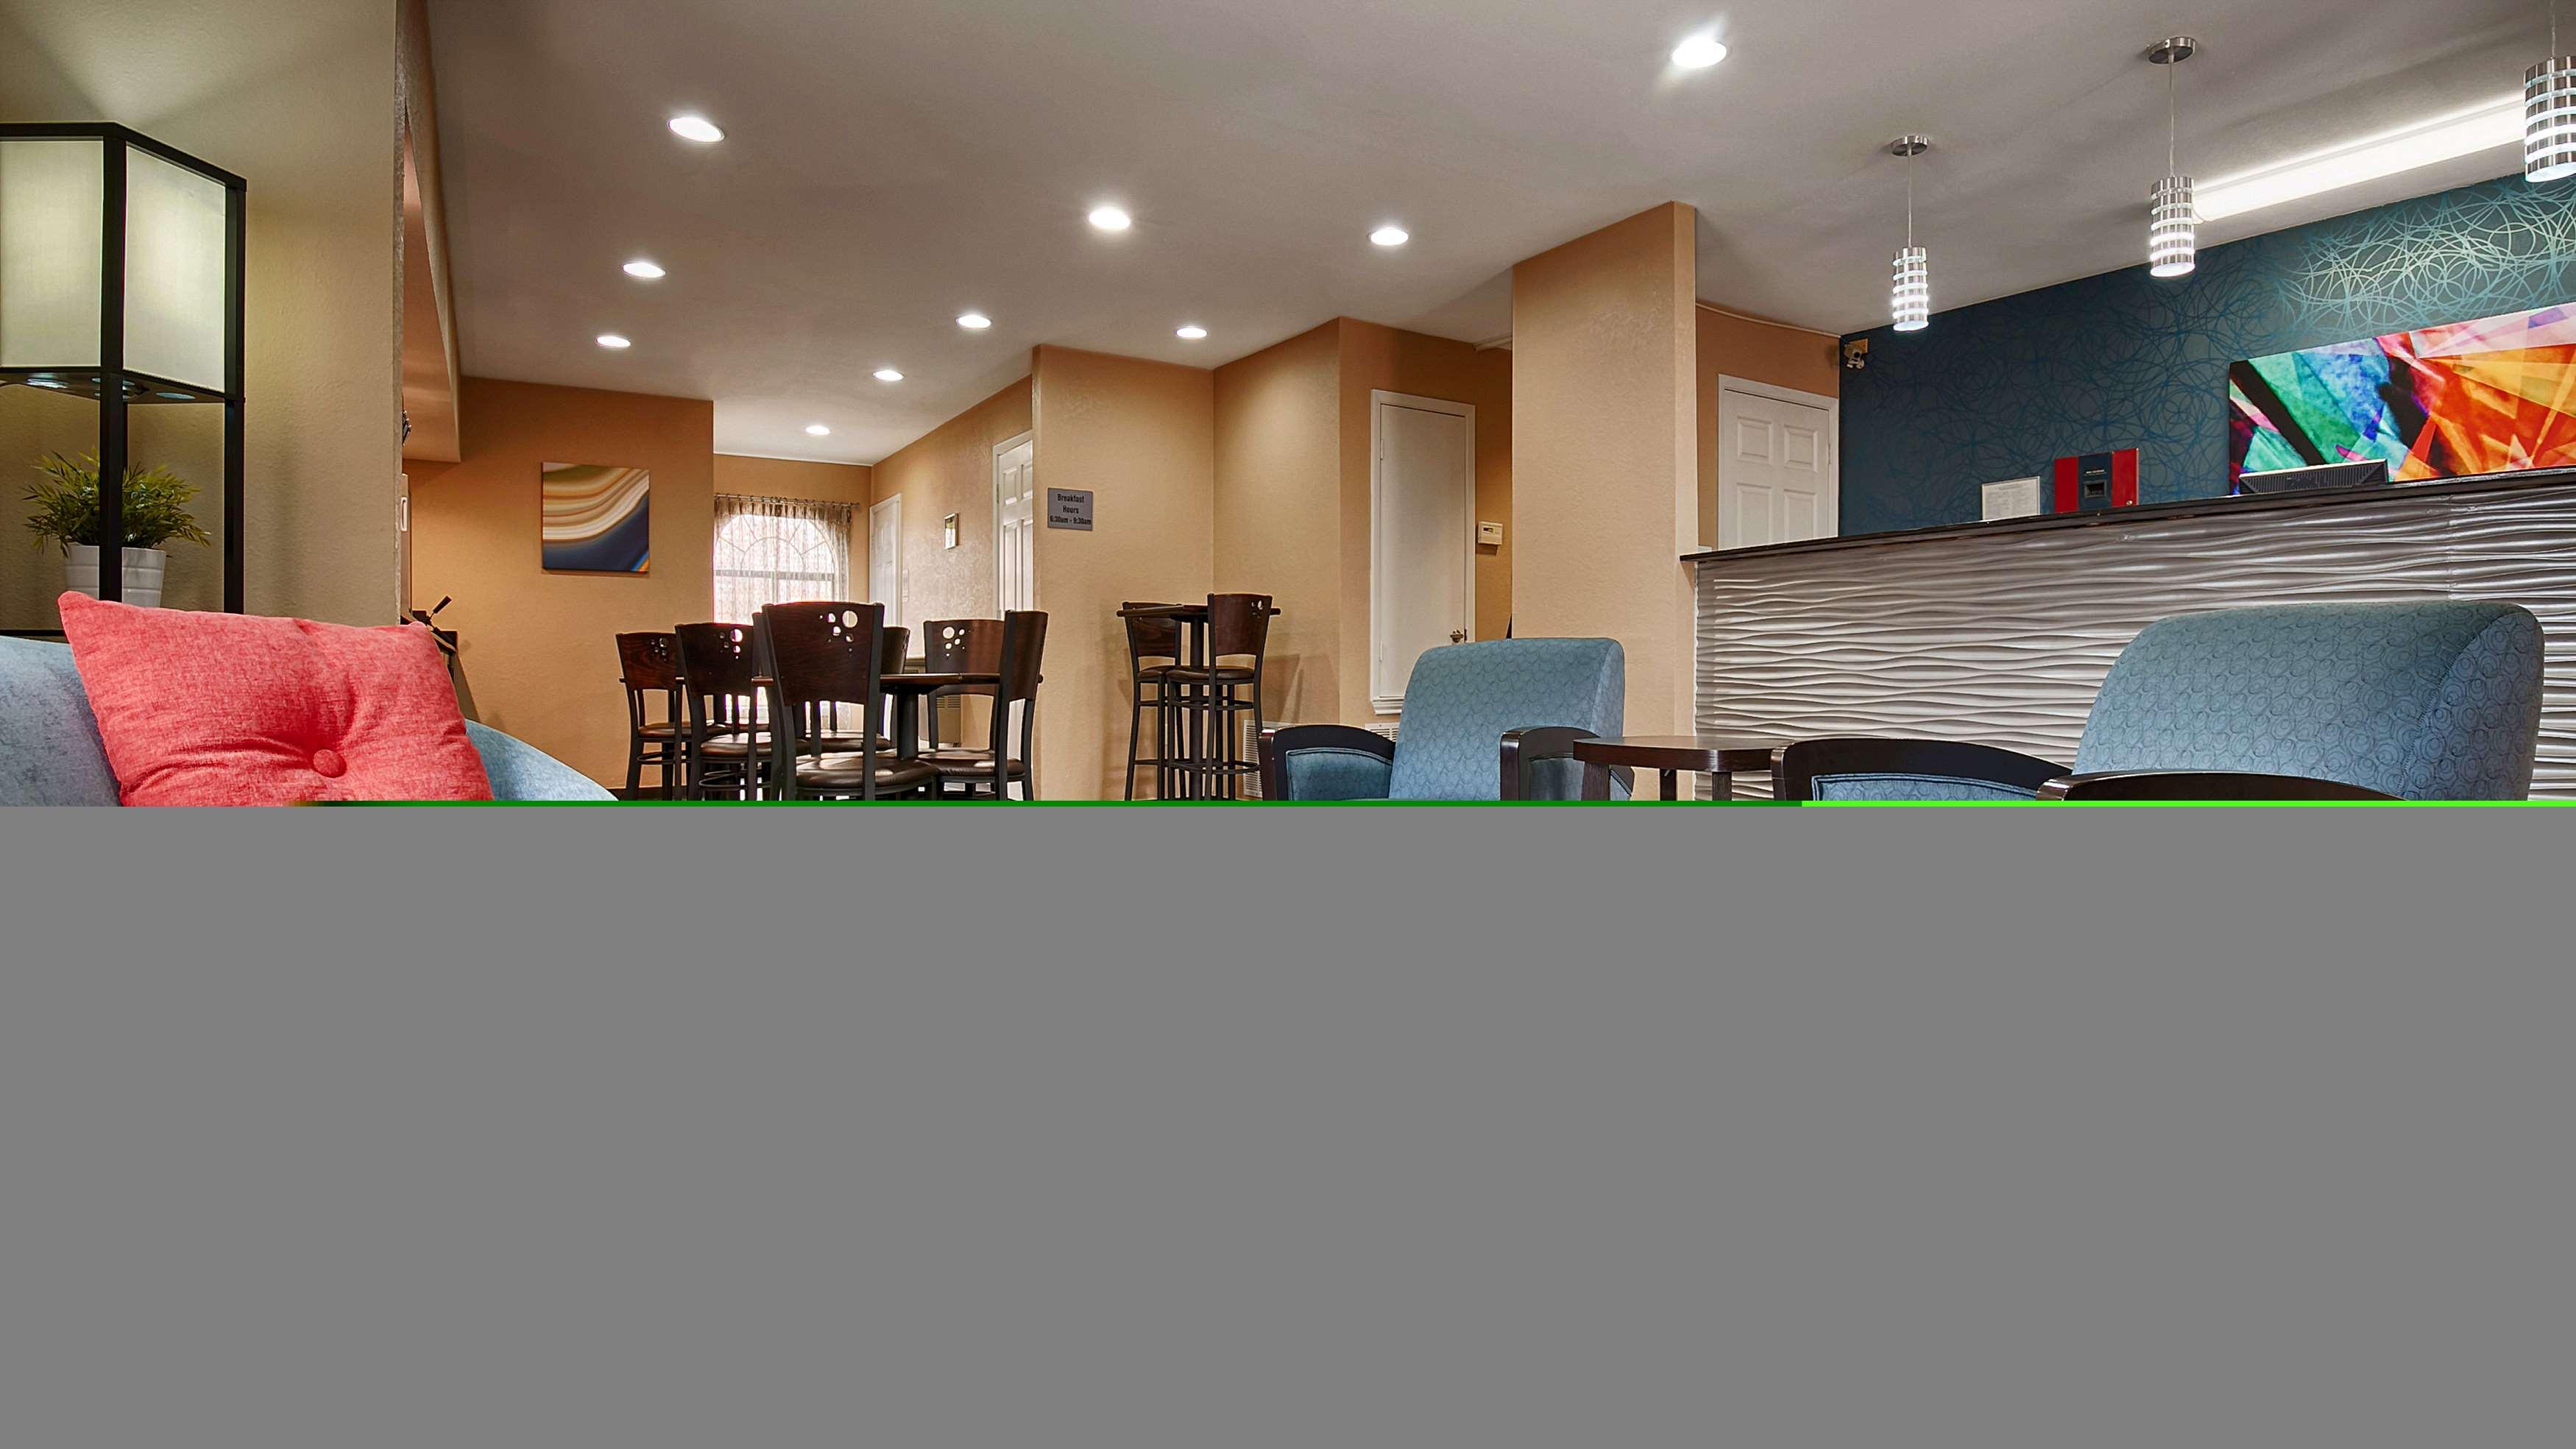 Best Western Cedar Inn image 24